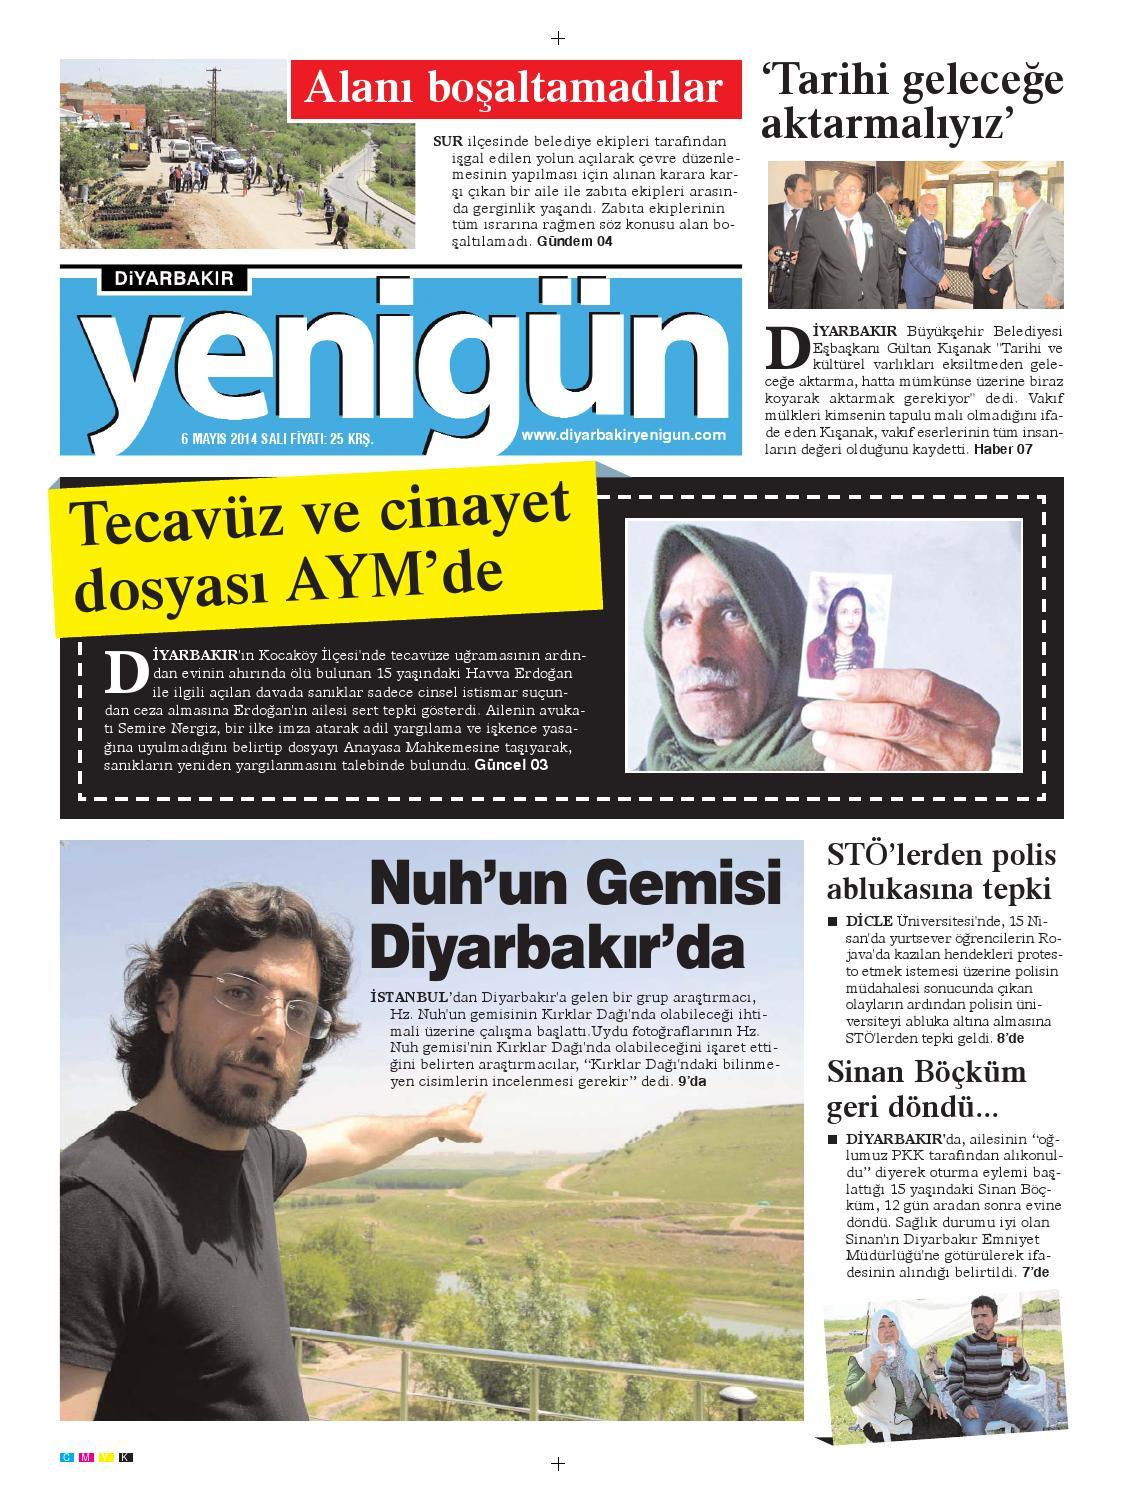 Diyarbakir Yenigun Gazetesi 6 Mayis 2014 By Osman Ergun Issuu